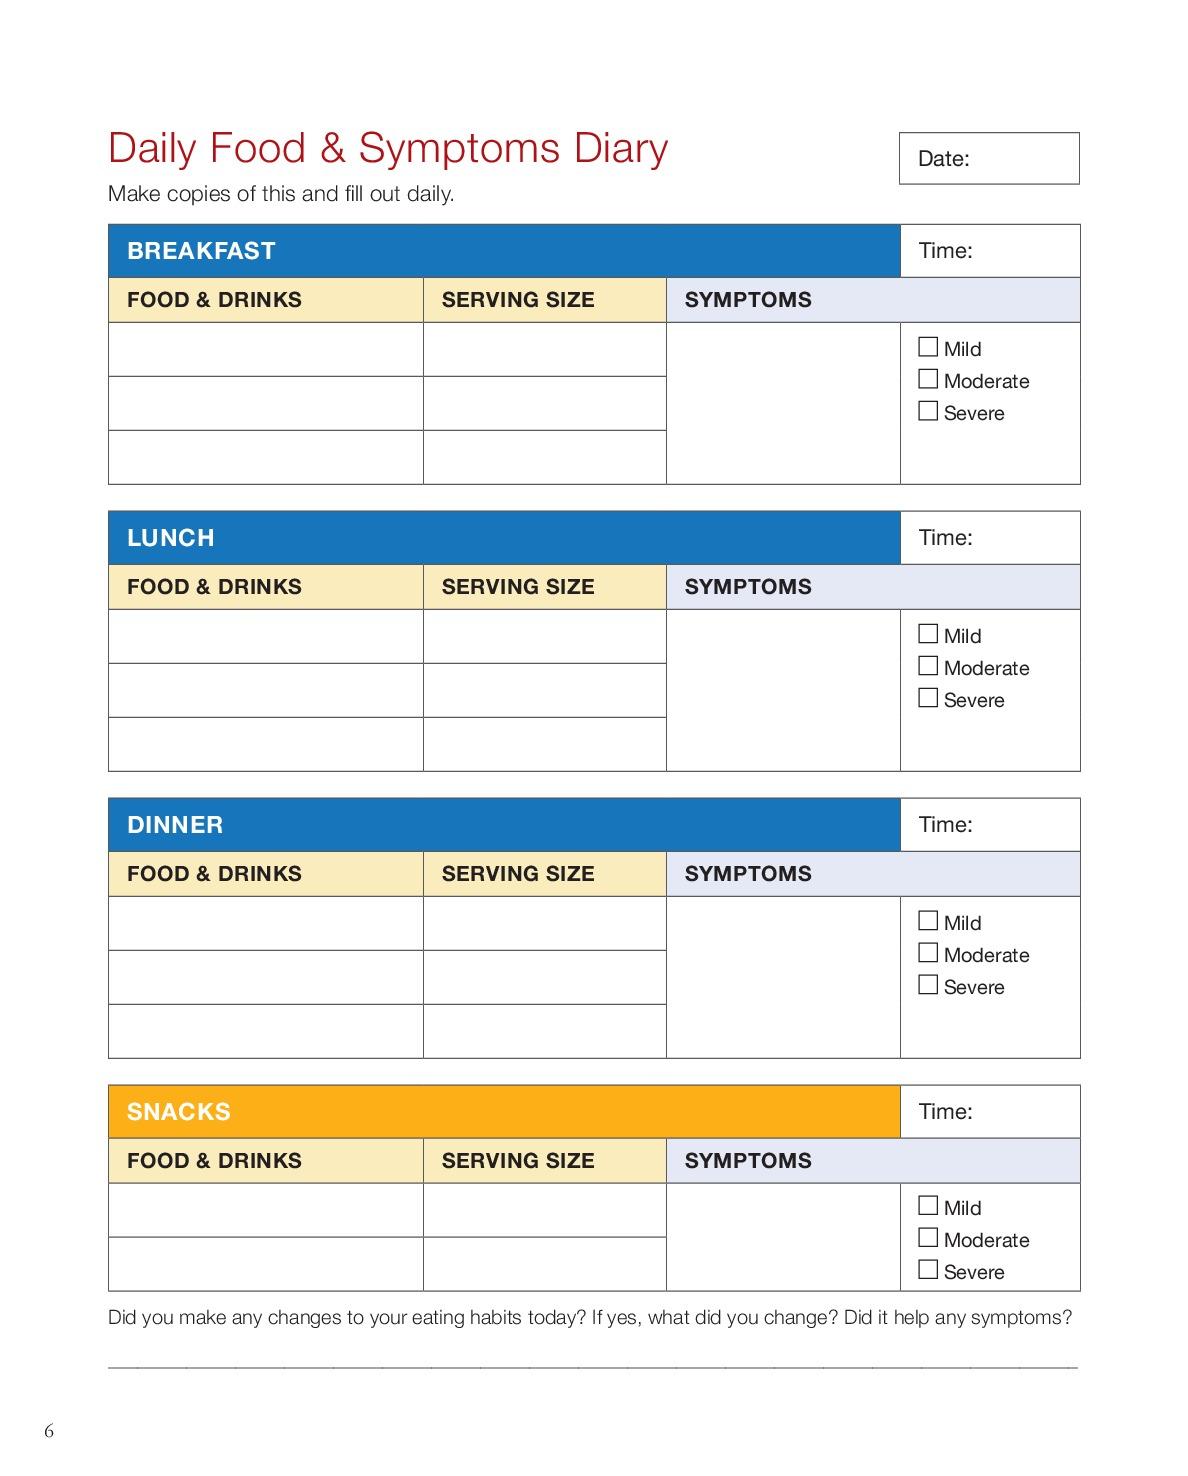 FSAC Daily Food & Symptoms Diary